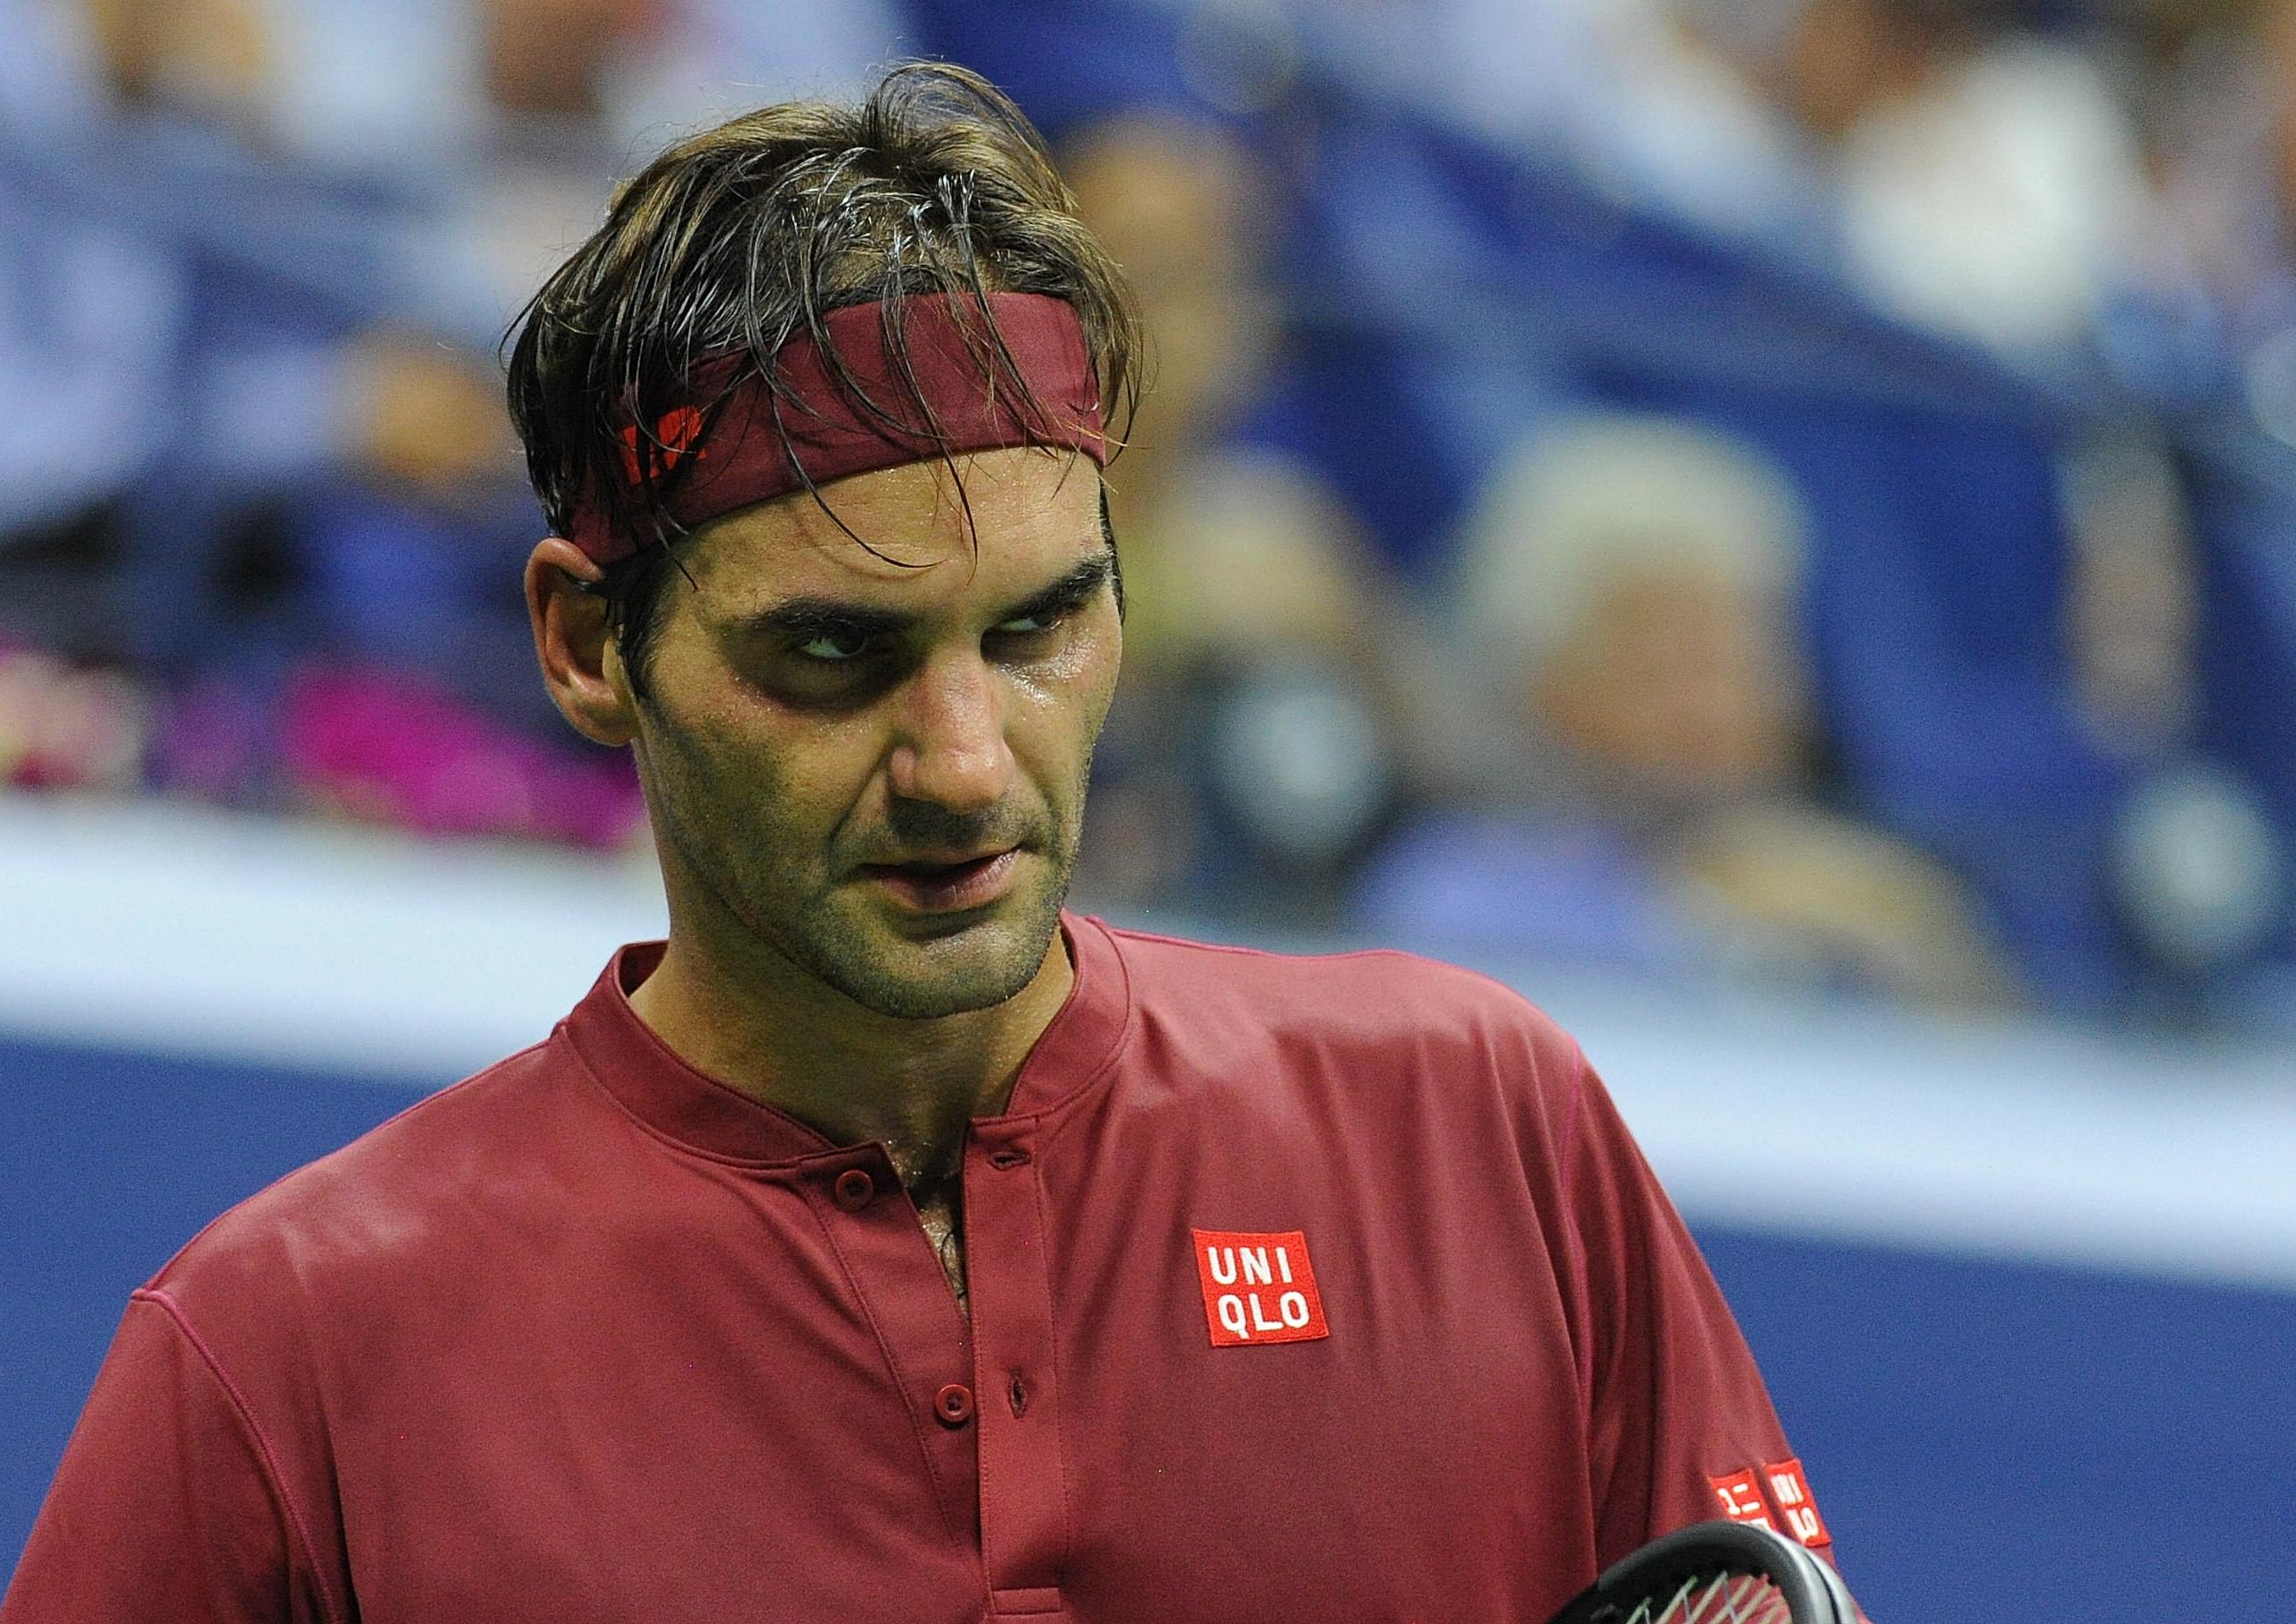 Tennis - ATP - Federer, la blessure cachée